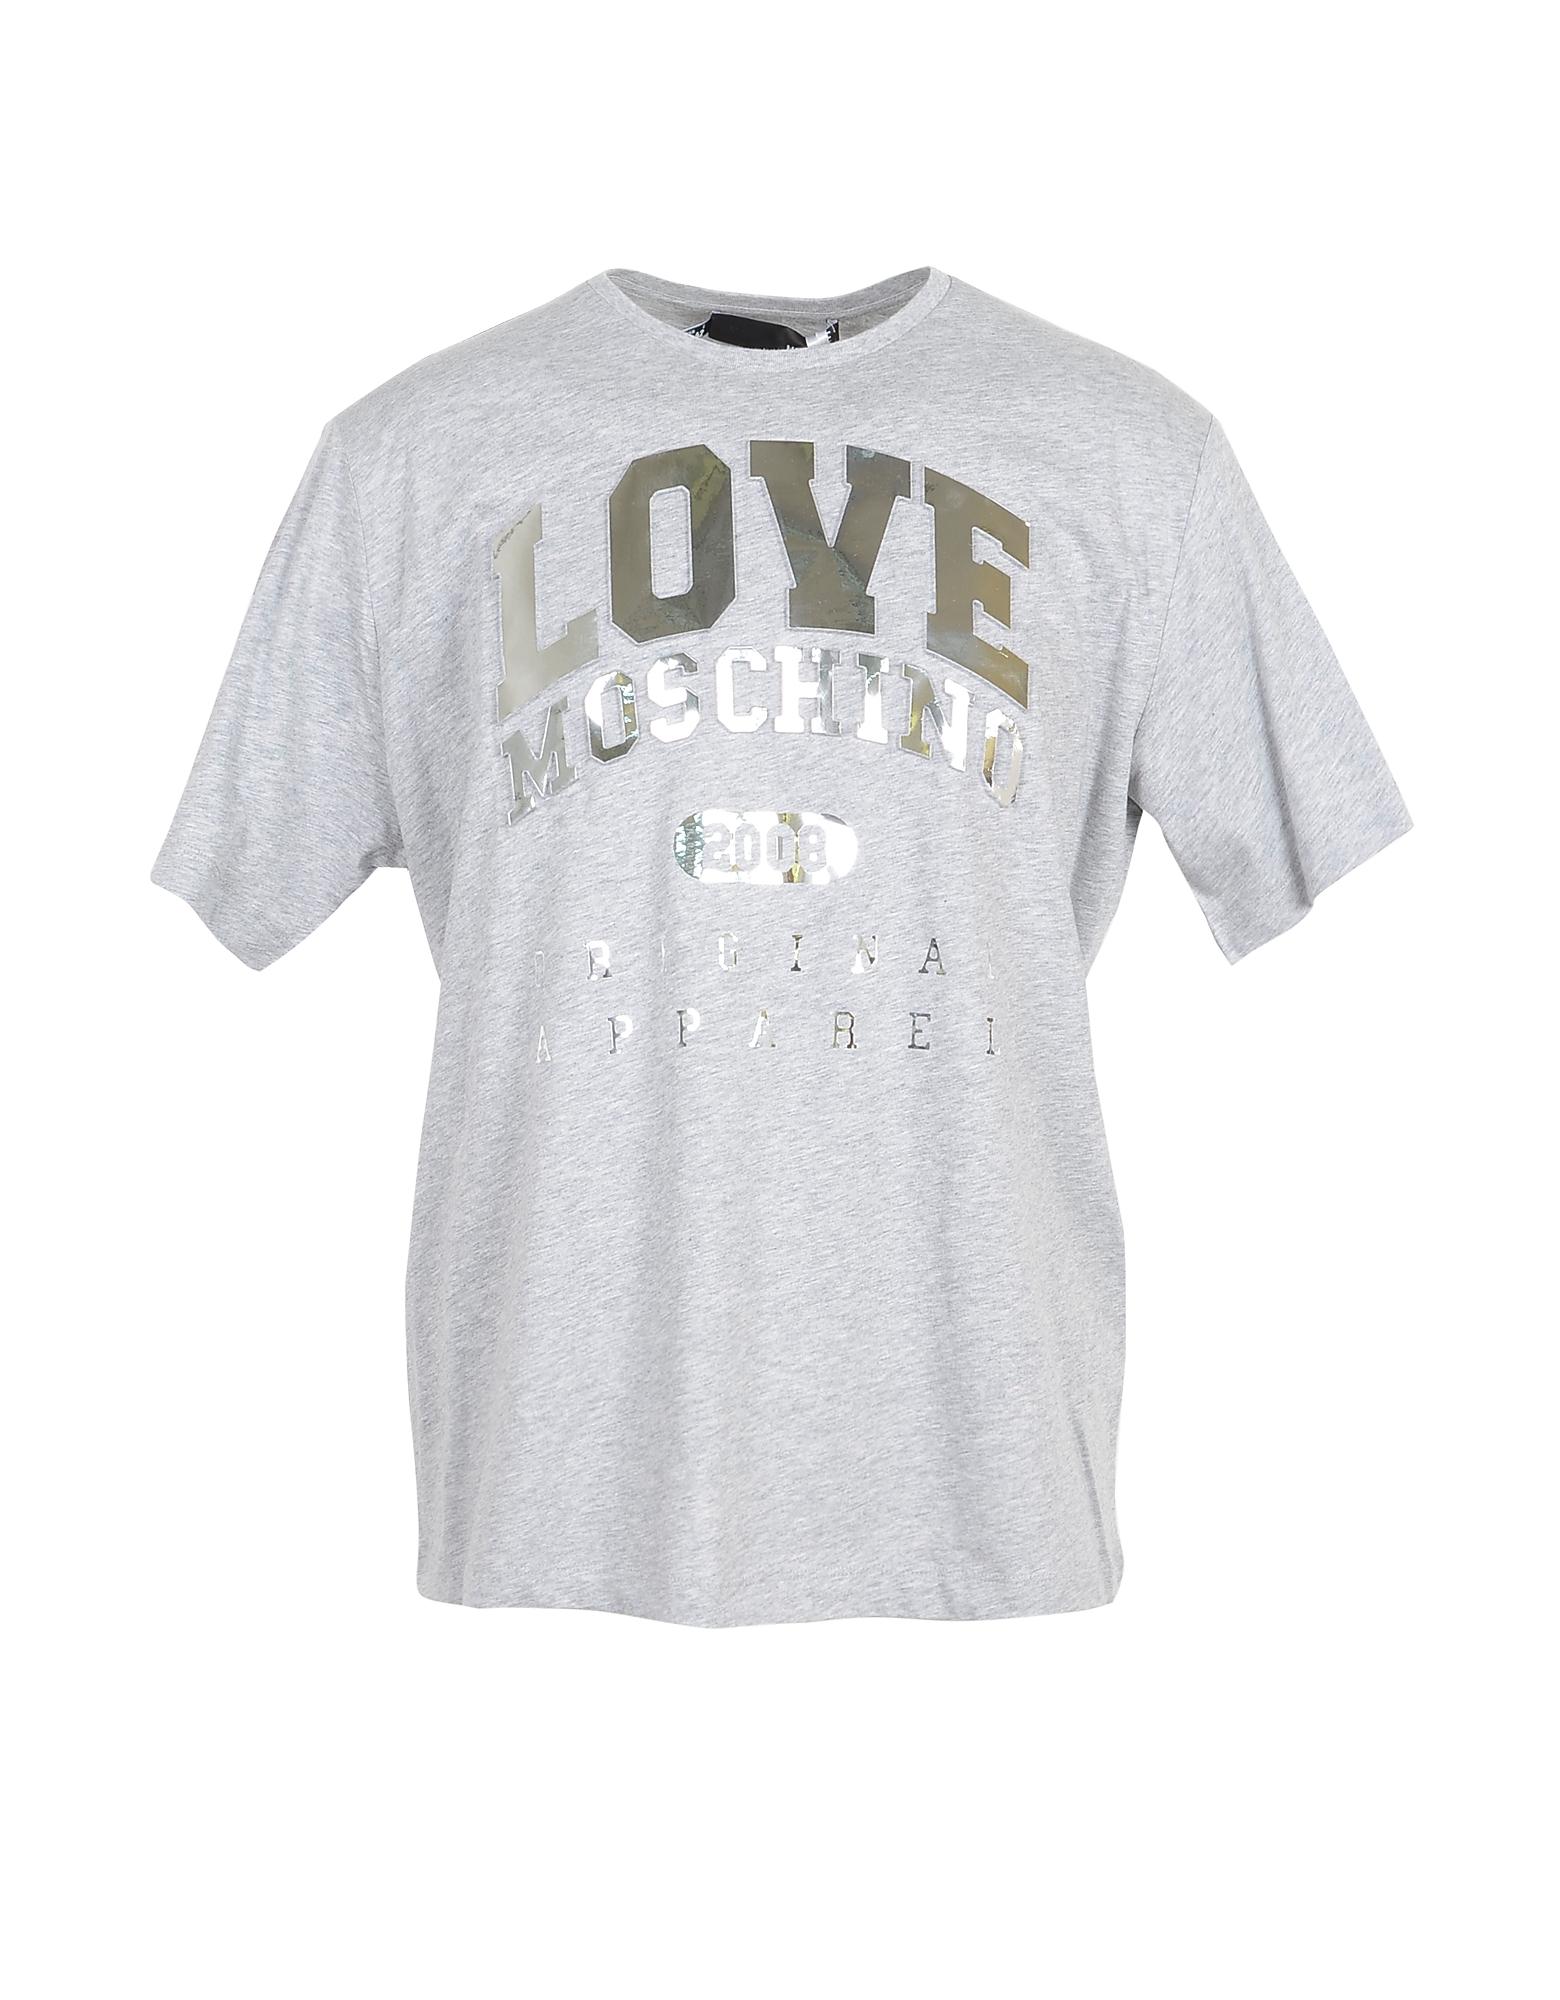 Love Moschino Designer T-Shirts & Tops, Melange Gray & Gold Signature Cotton Women's T-Shirt